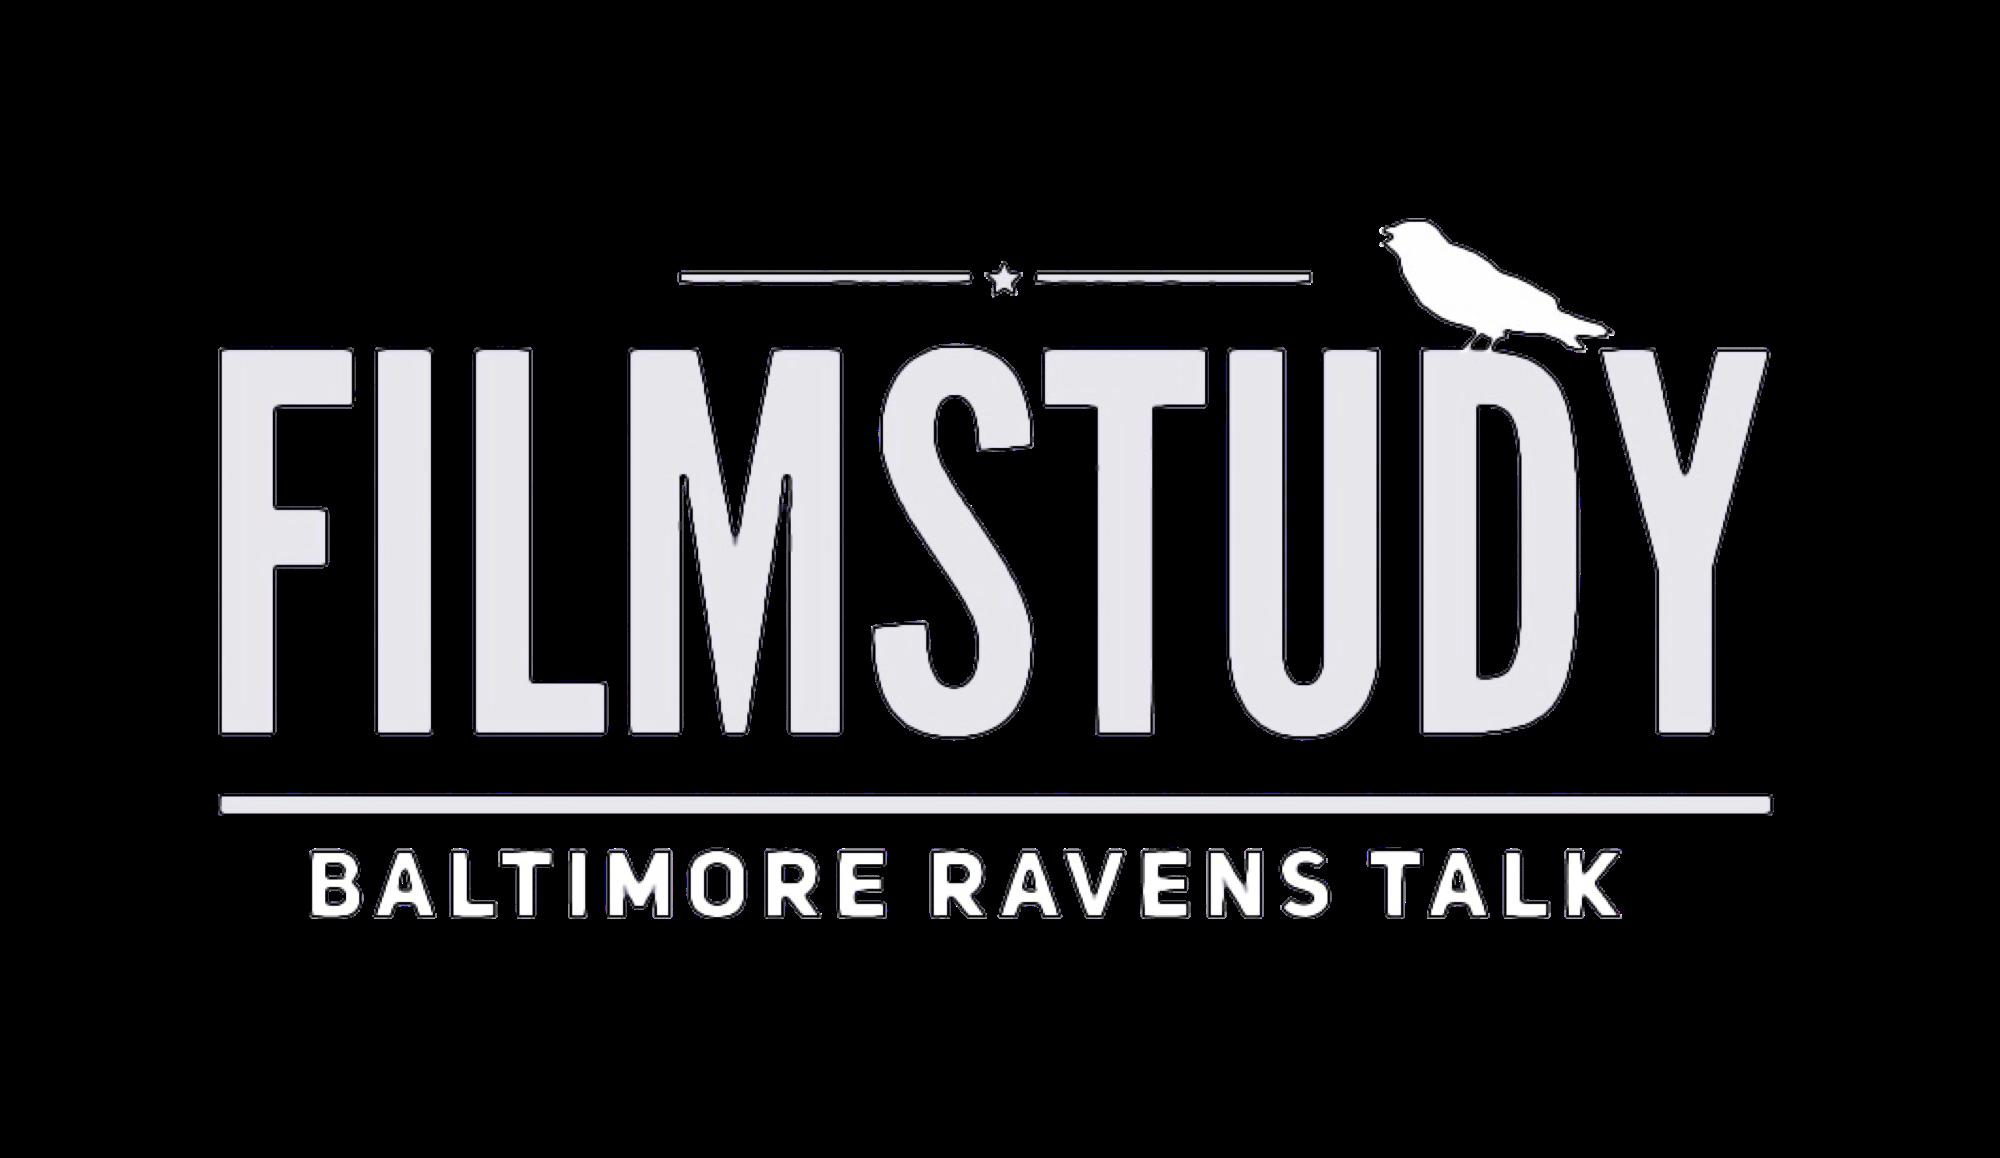 FilmstudyBaltimore